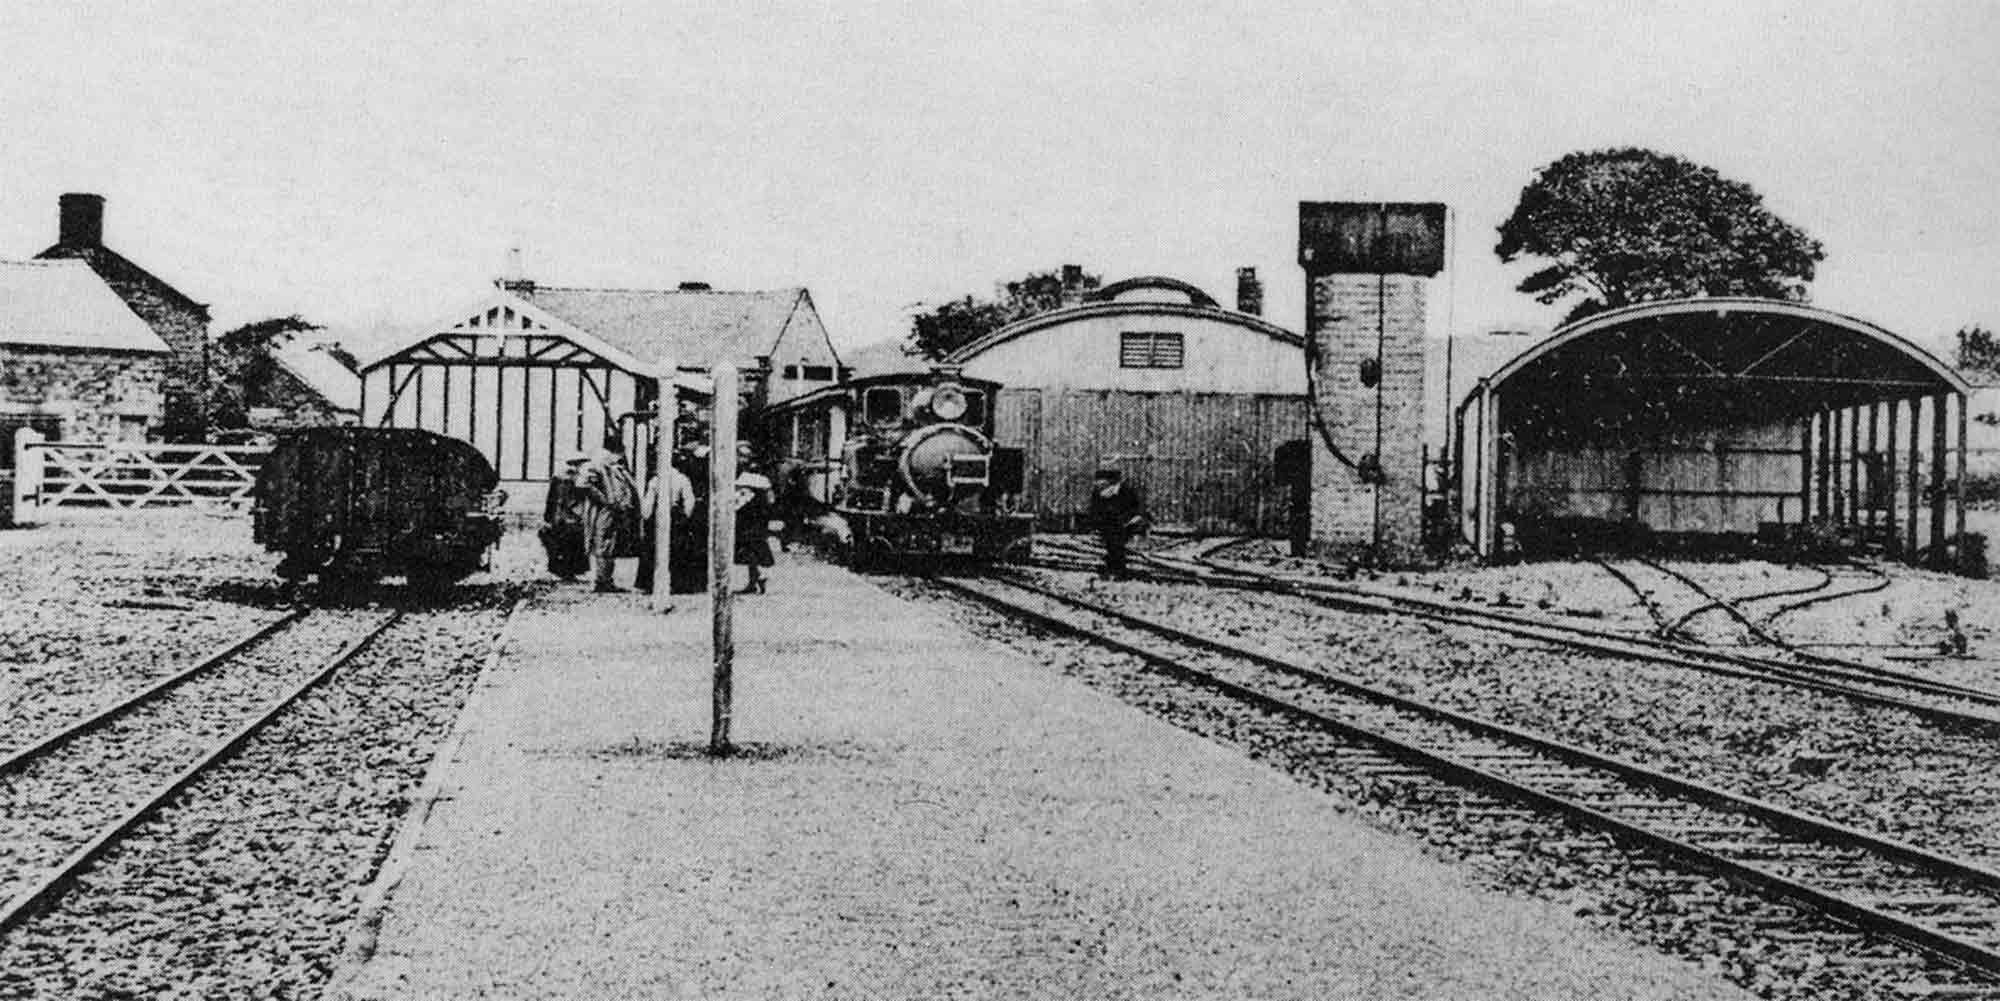 Hulme End railway station historic photograph